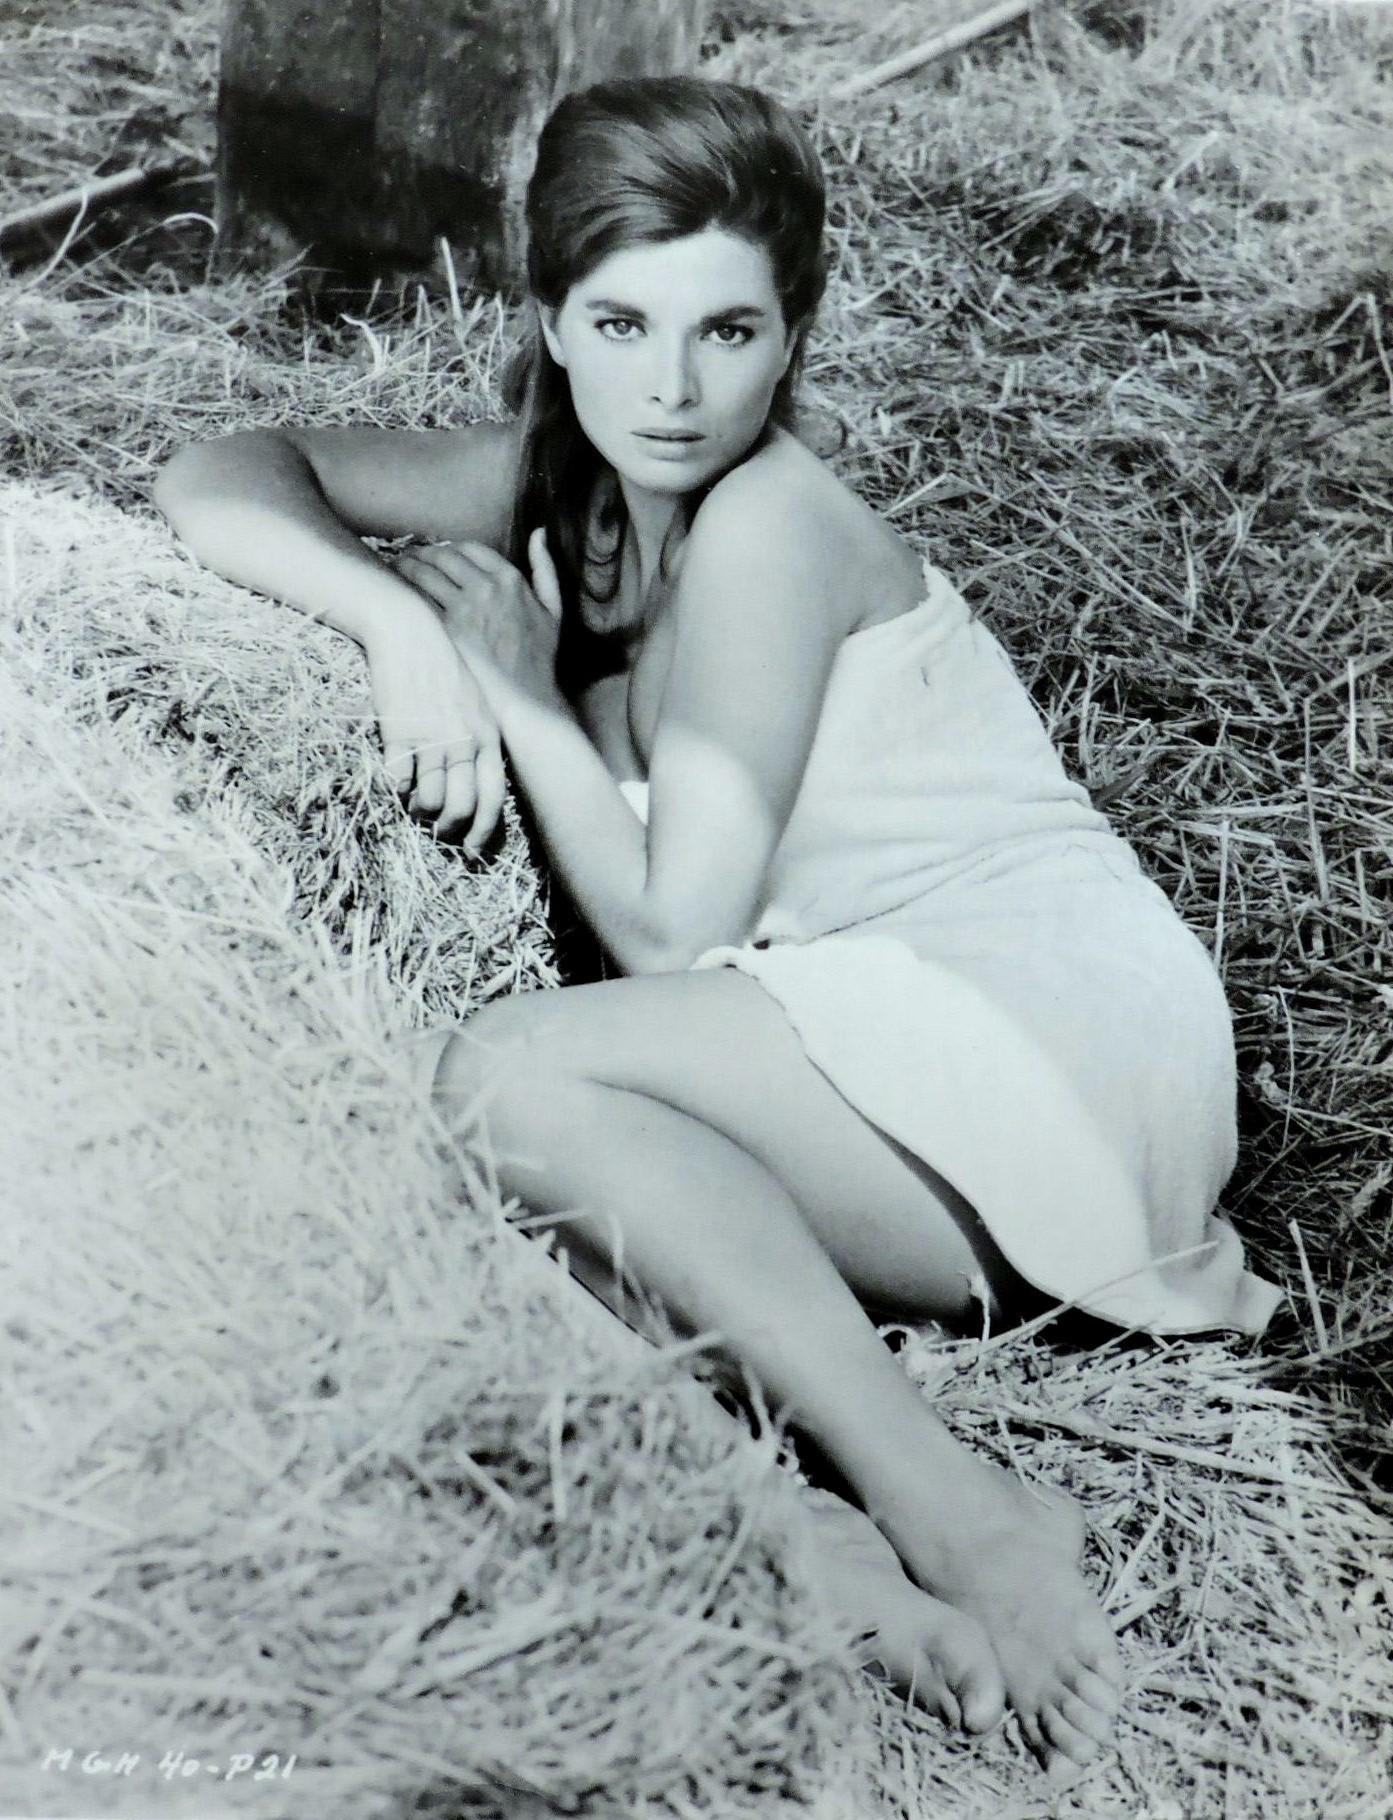 Sharon McMurtry,Justis Bolding Porno tube Steve Huison (born 1962),Lada Engchawadechasilp